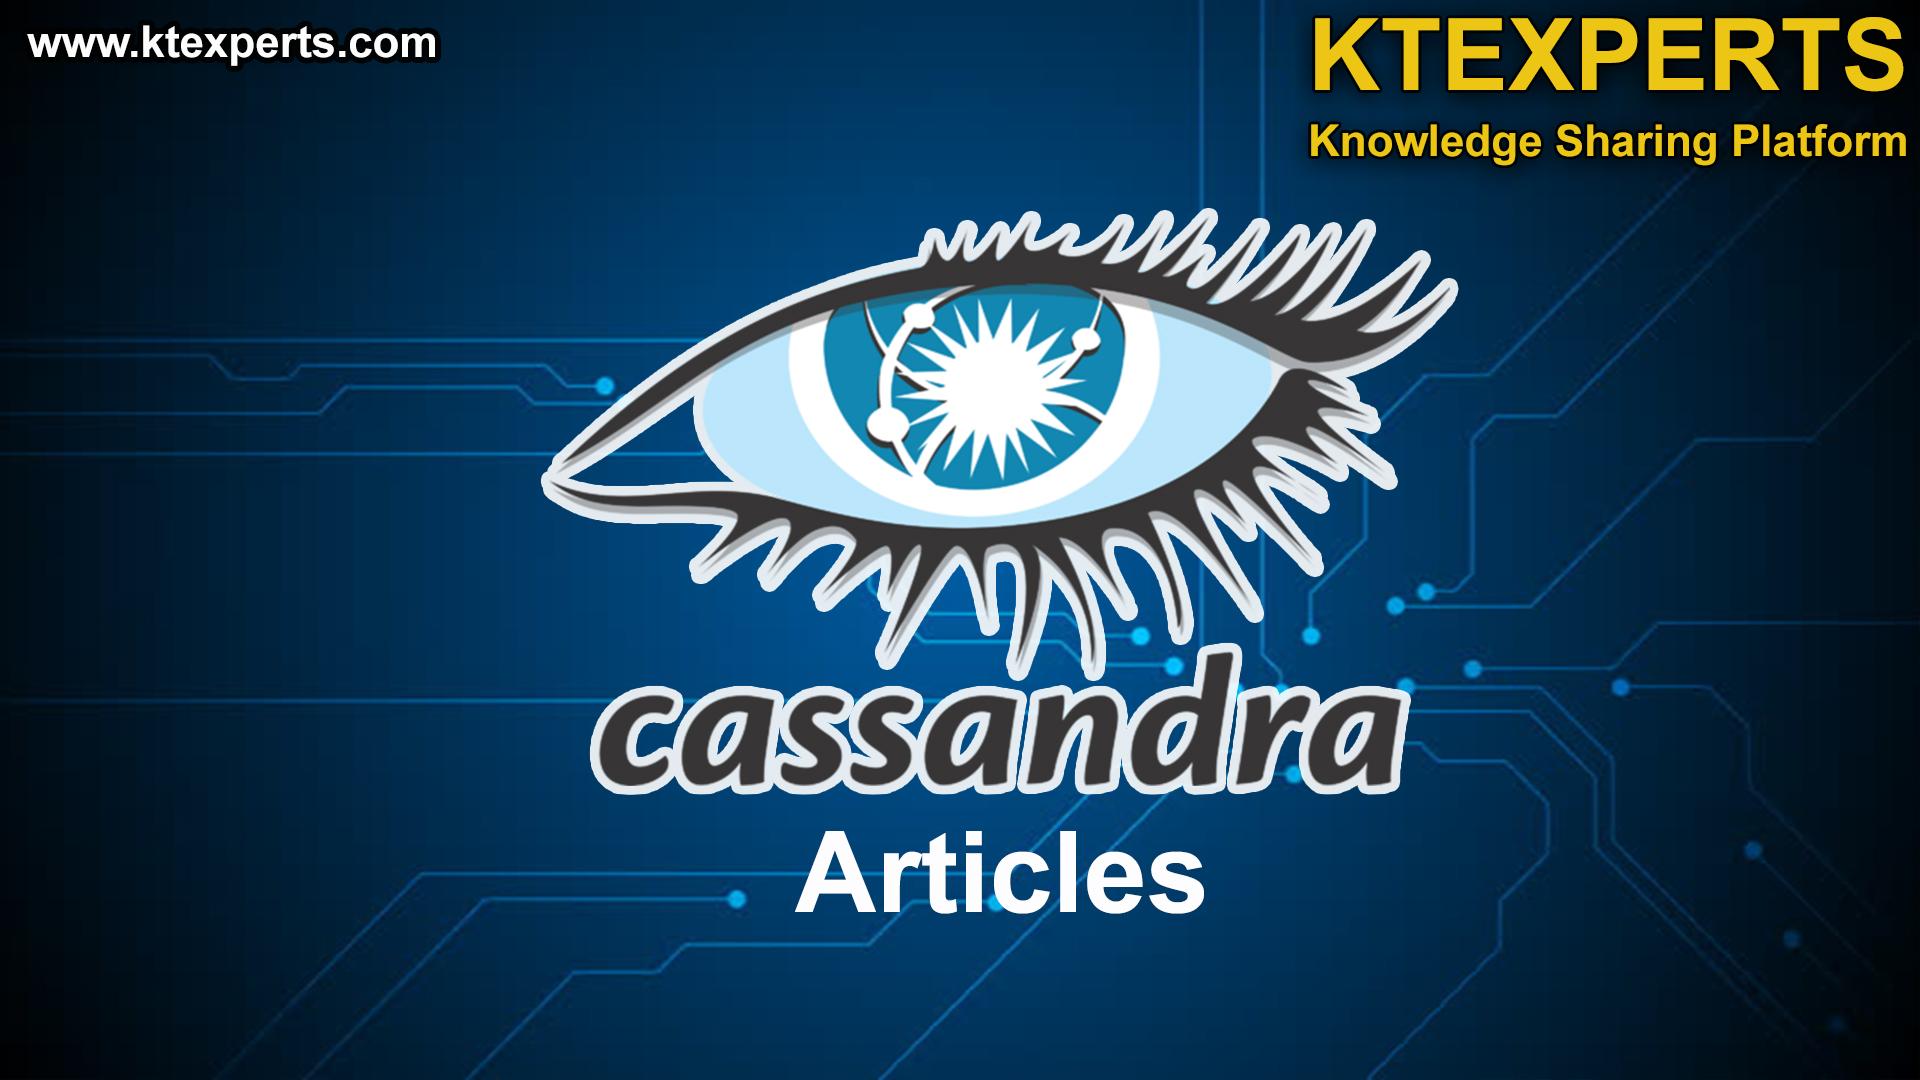 CASSANDRA ARTICLES.